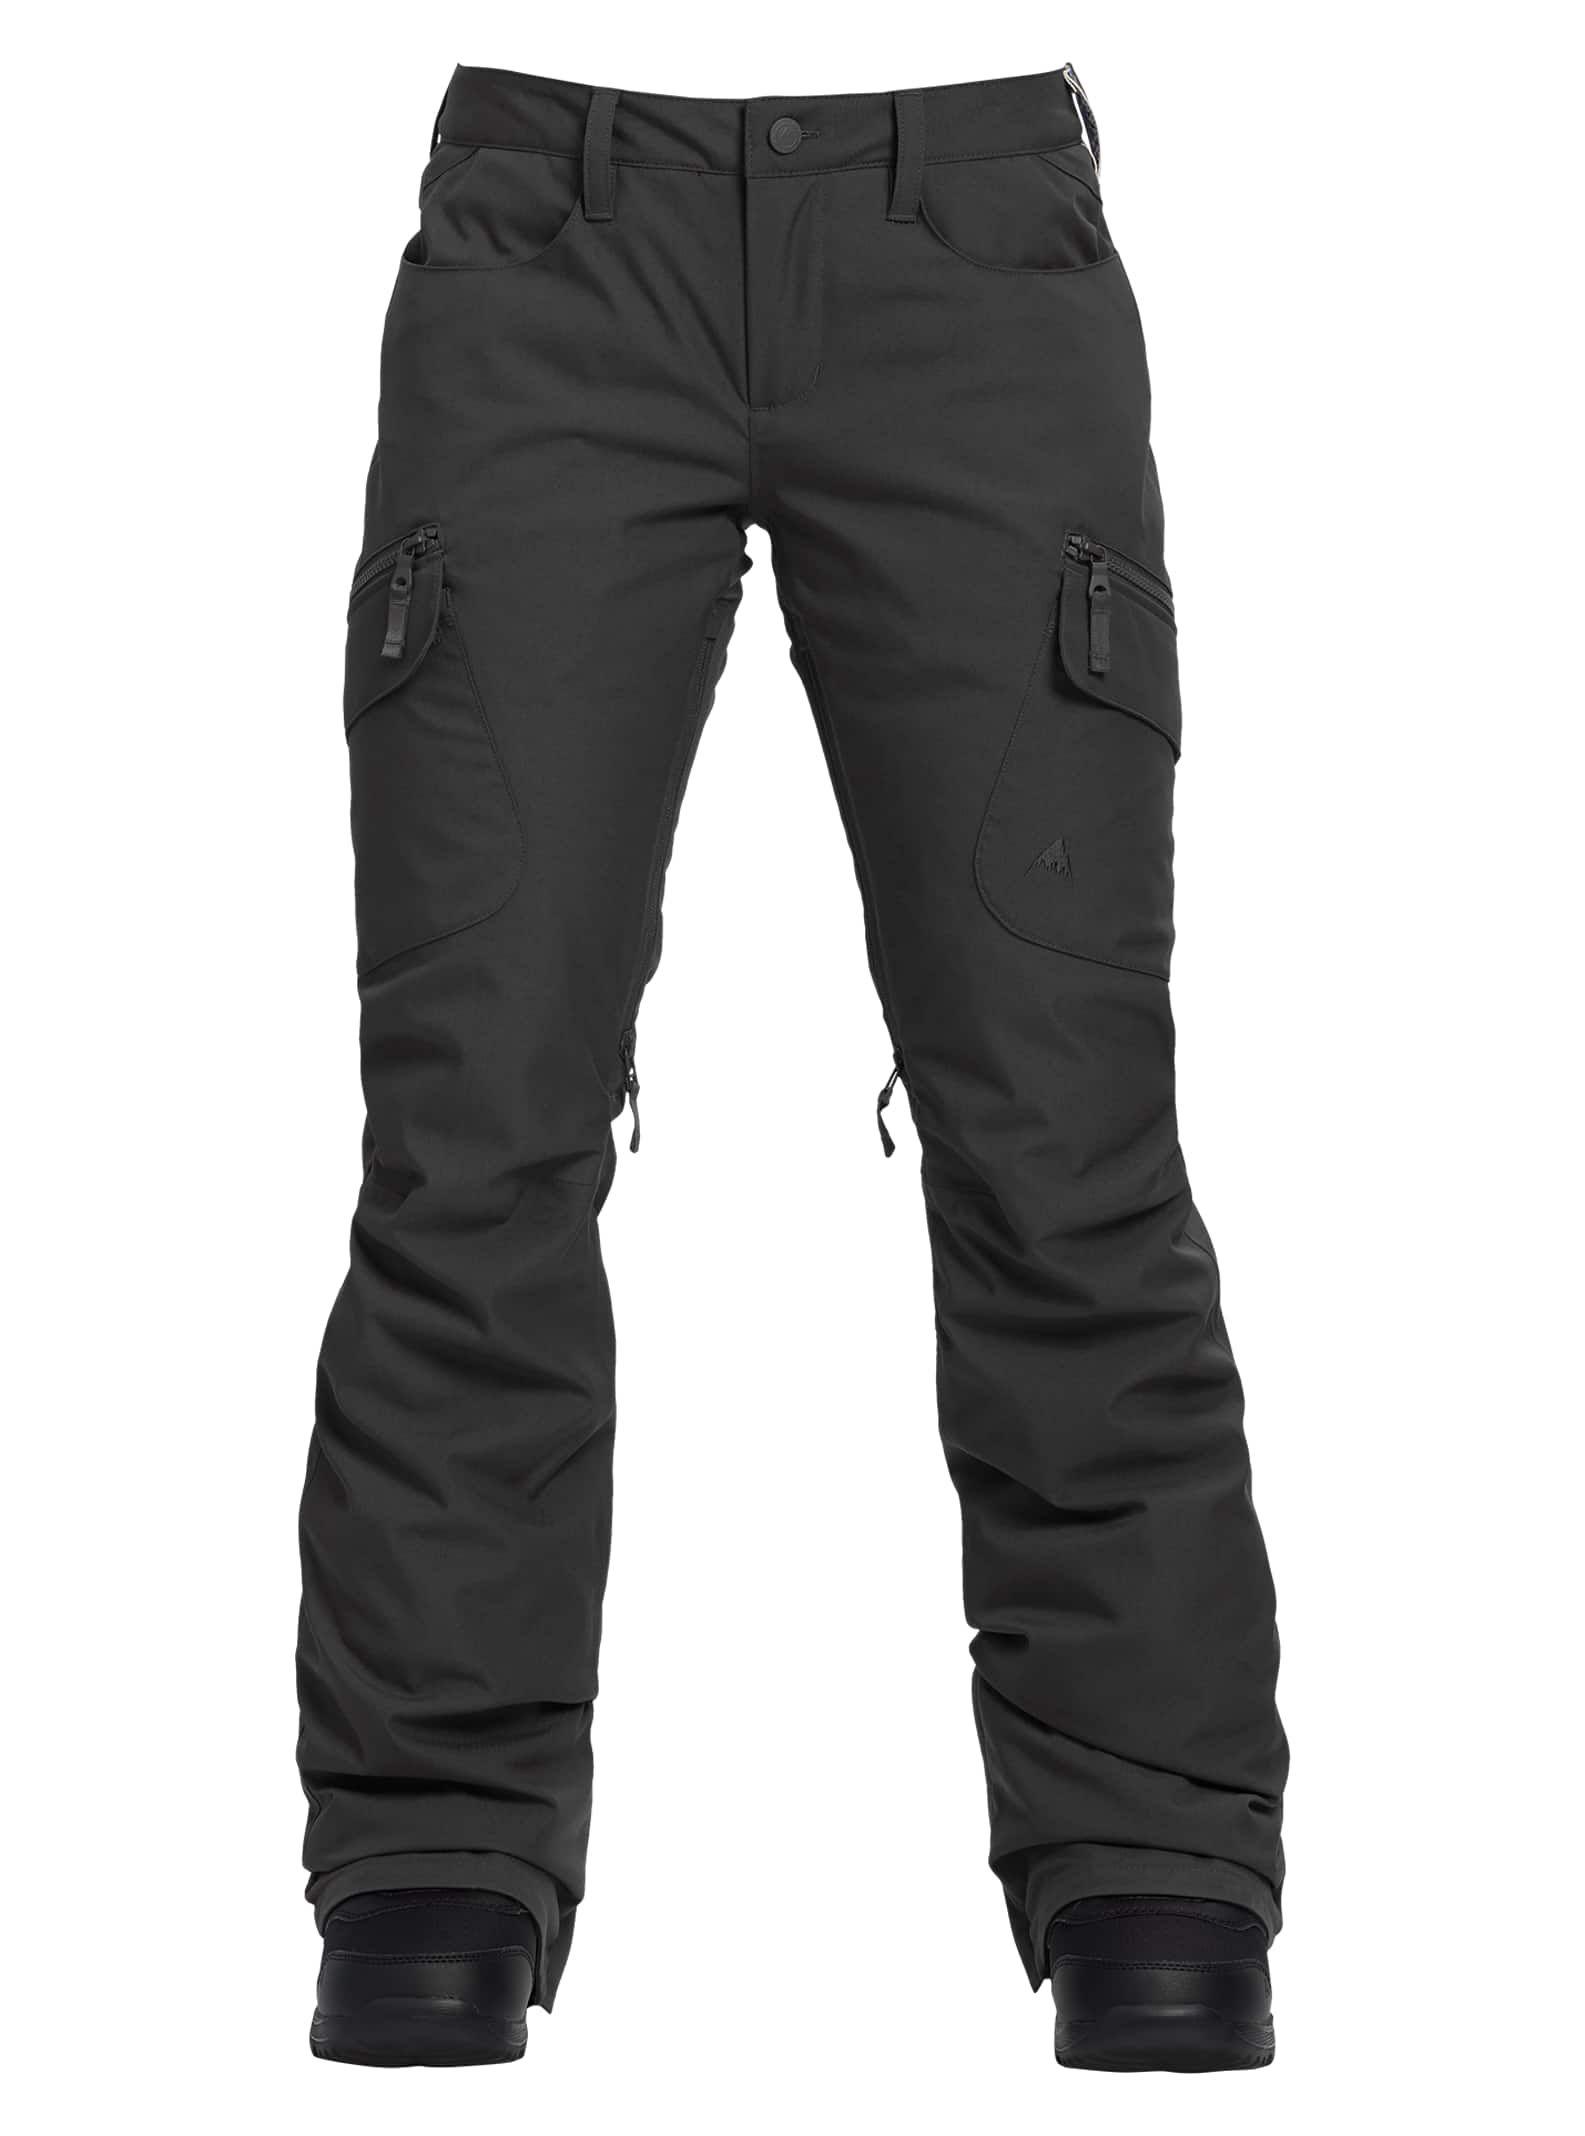 014fe11e73af Burton TWC Sugartown Snowboard Pants True Black - Women's...nice skinnies |  Boarding Heaven in 2019 | Snowboard pants, Burton snowboard pants,  Snowboarding ...